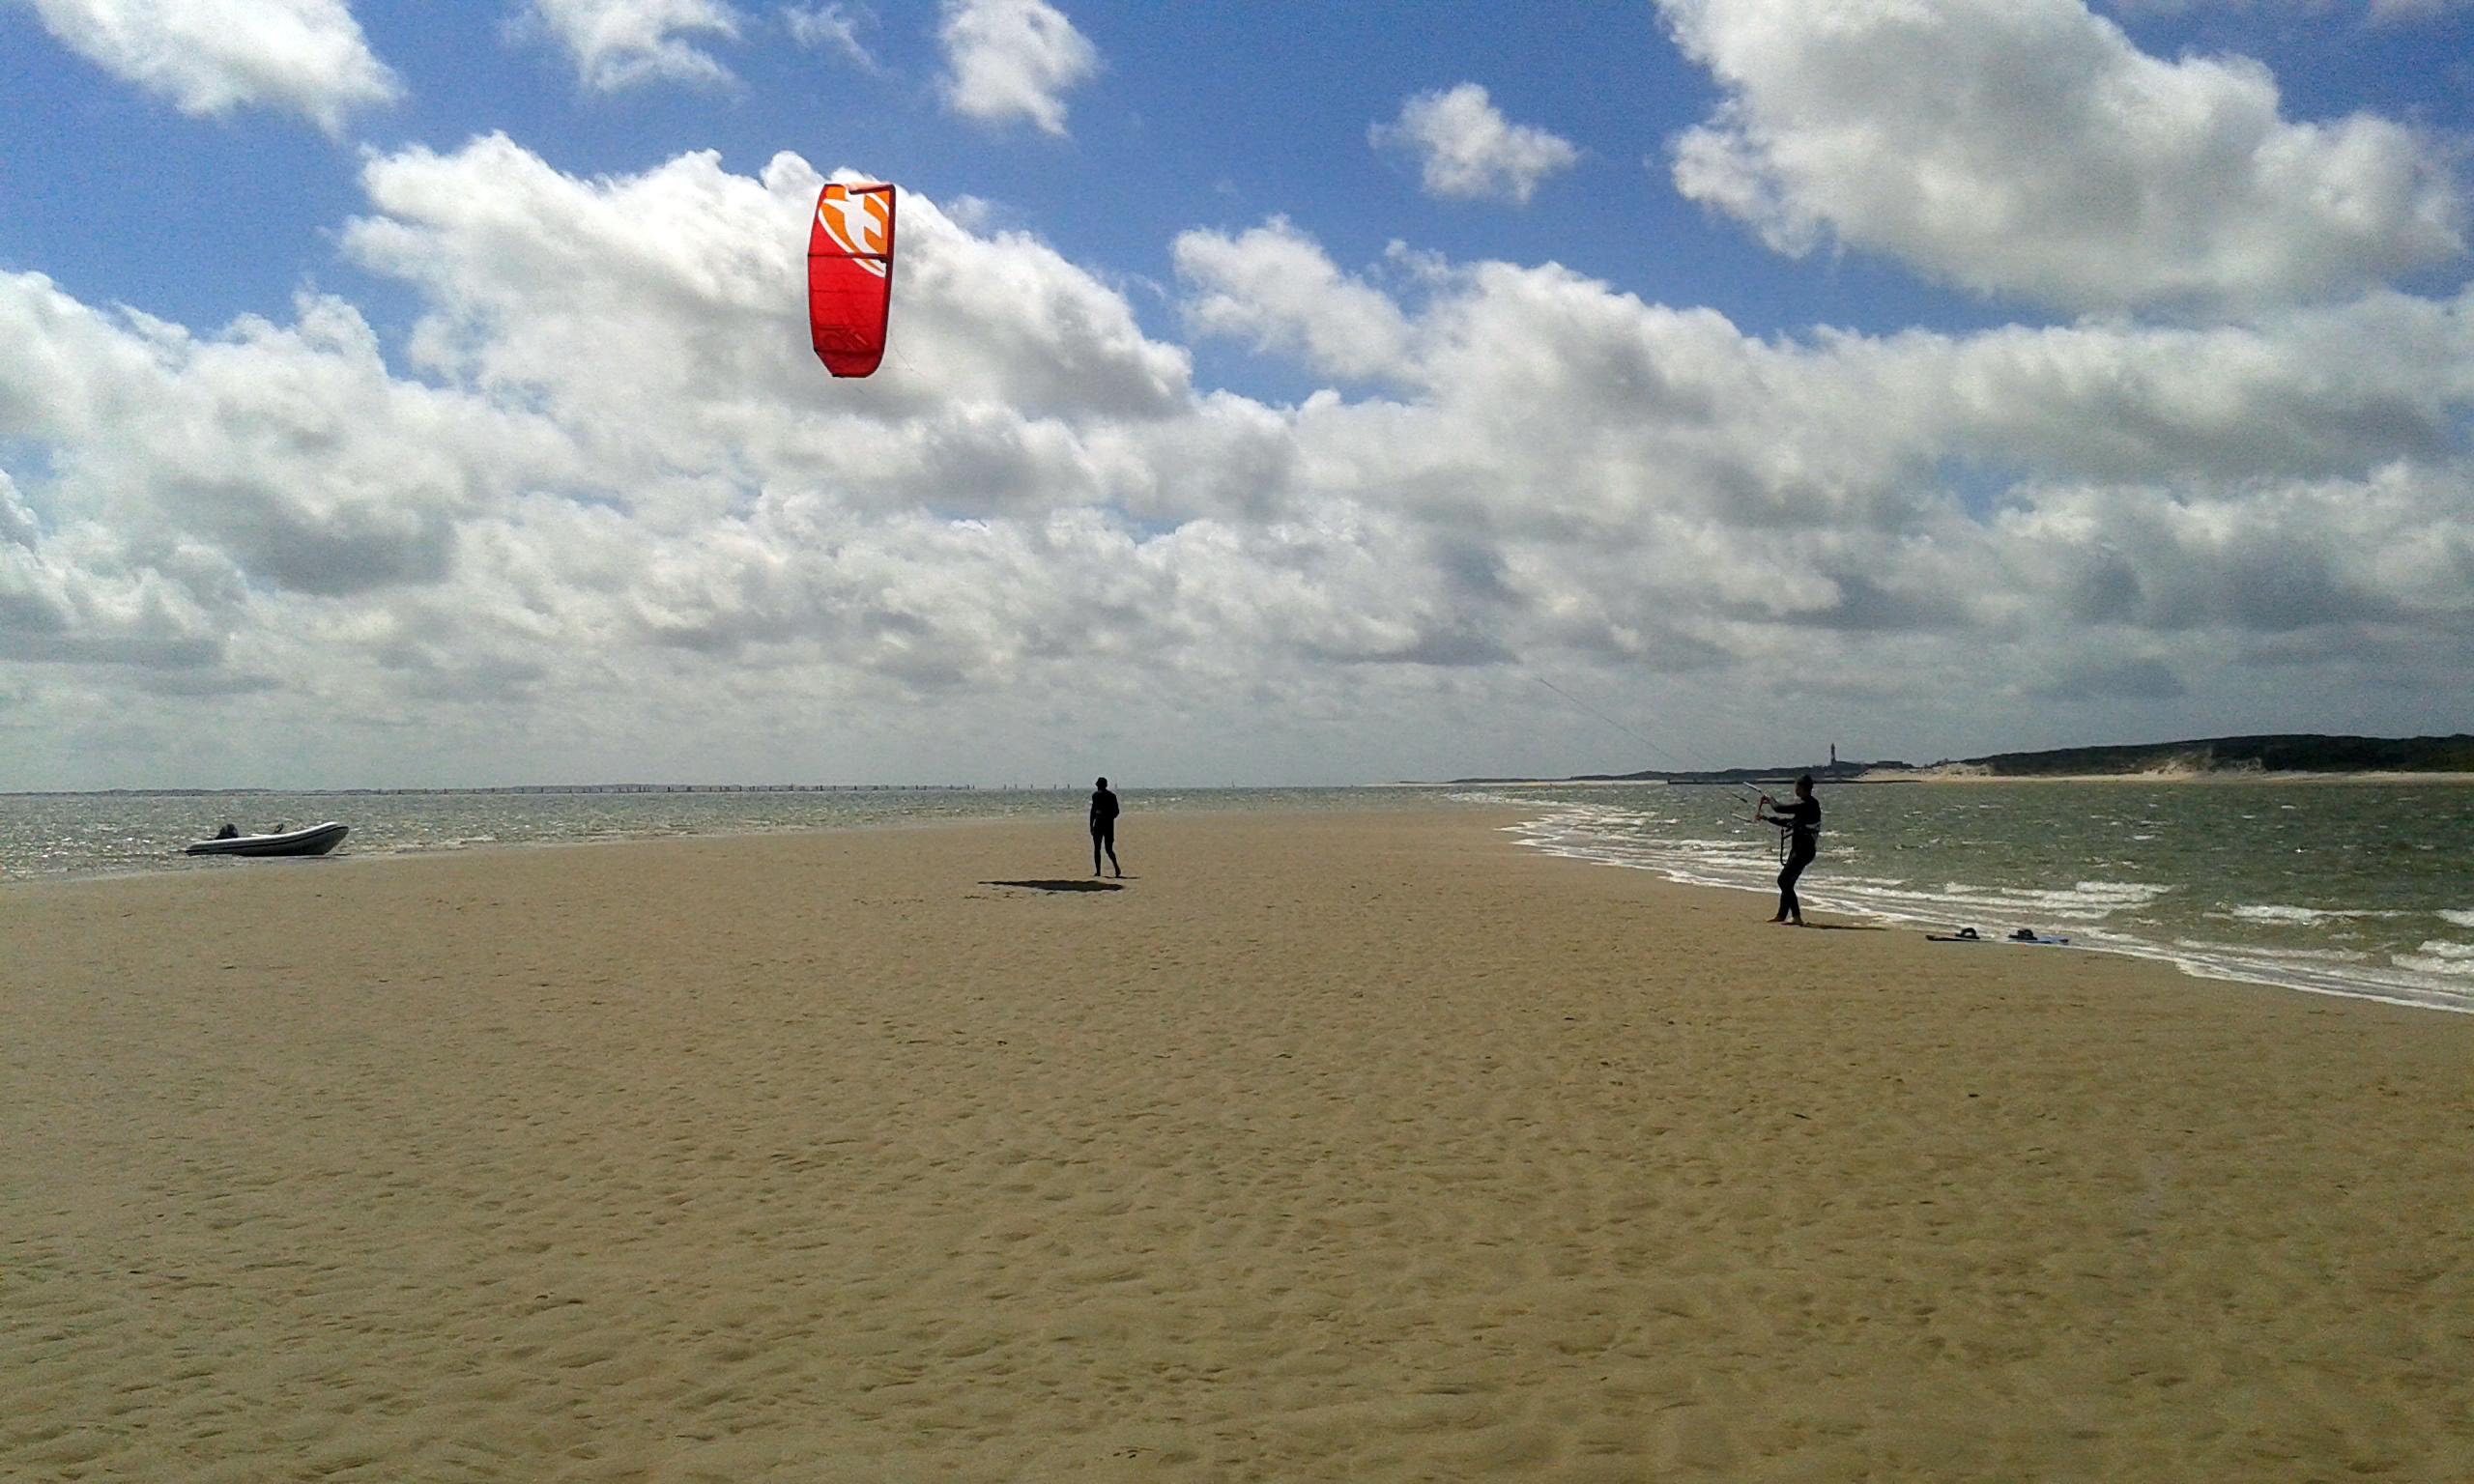 Kitesurfkurs auf der Sandbank vor Sylt | Hoernum Sandbank